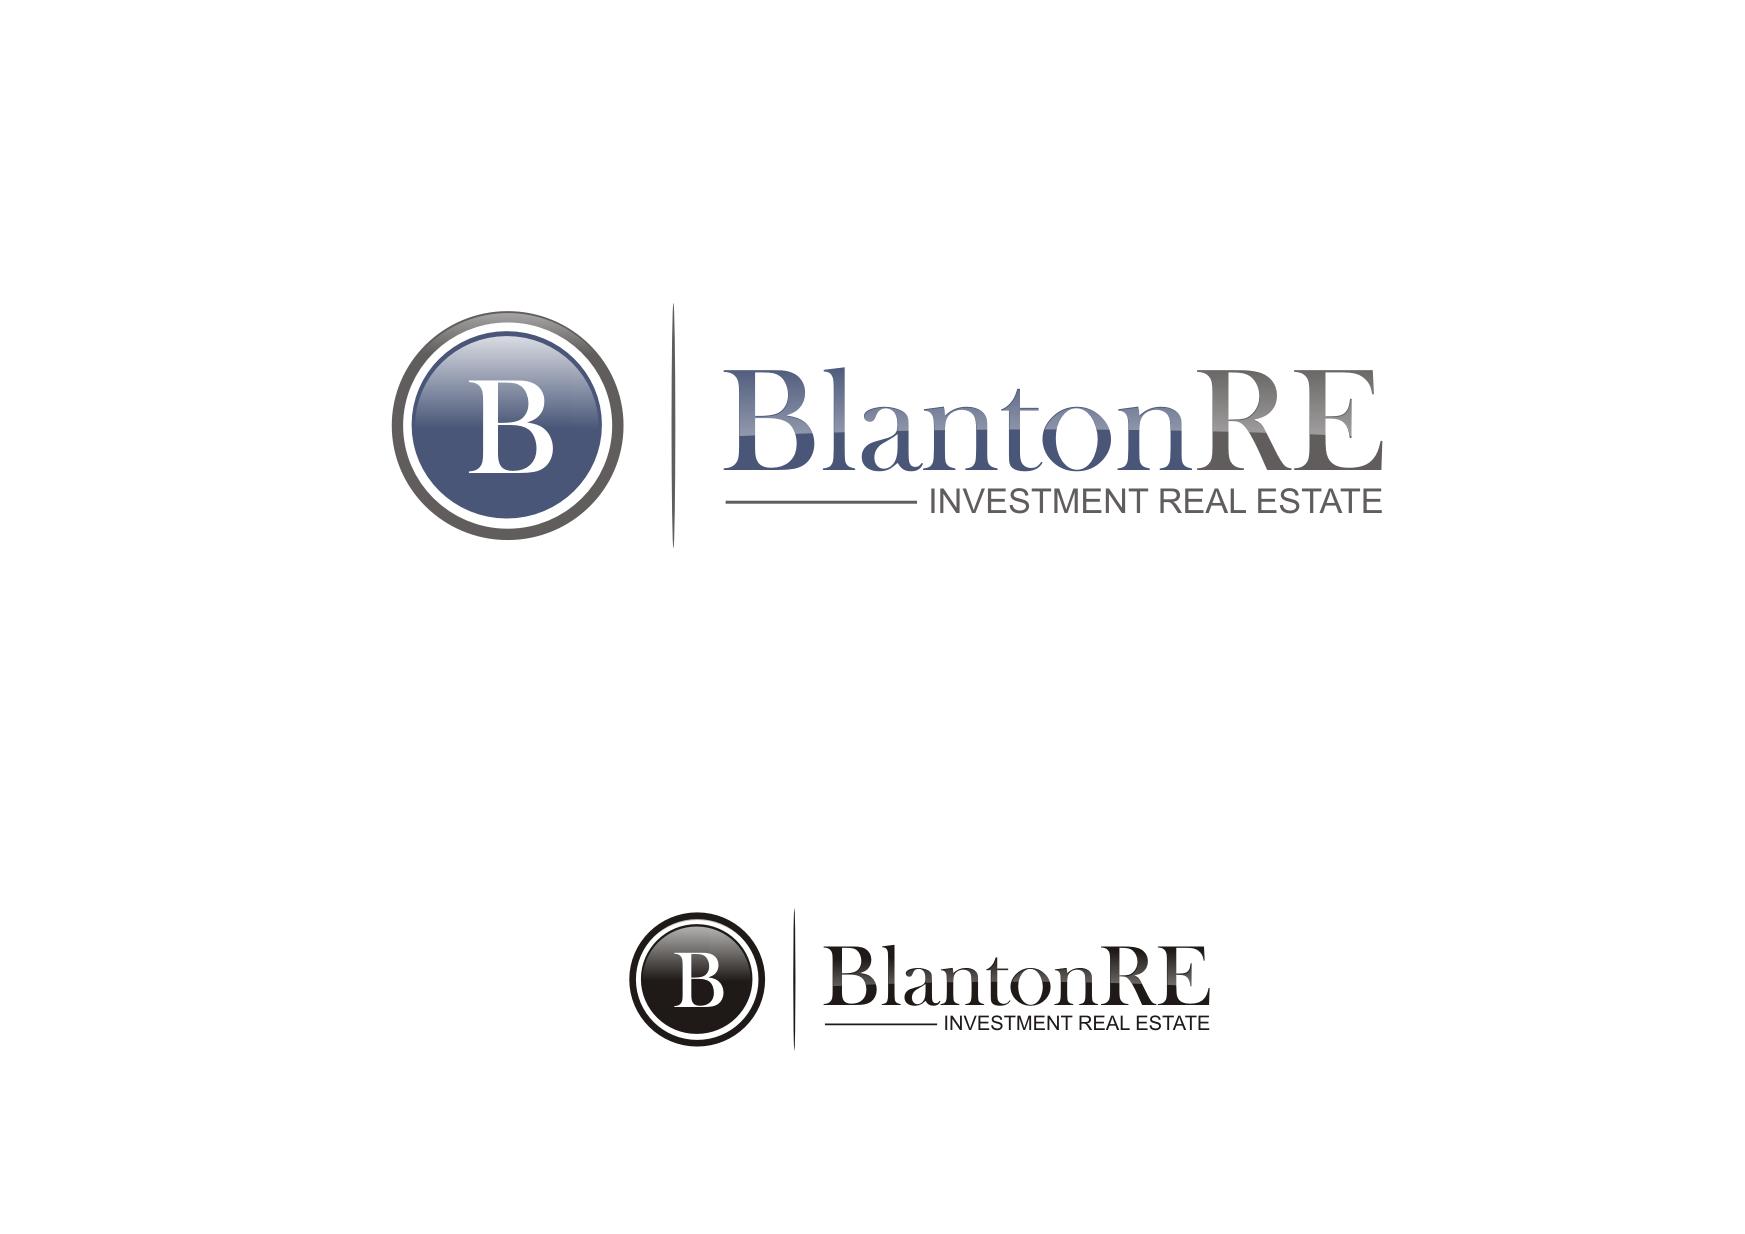 Blanton RE, LLC needs a new logo